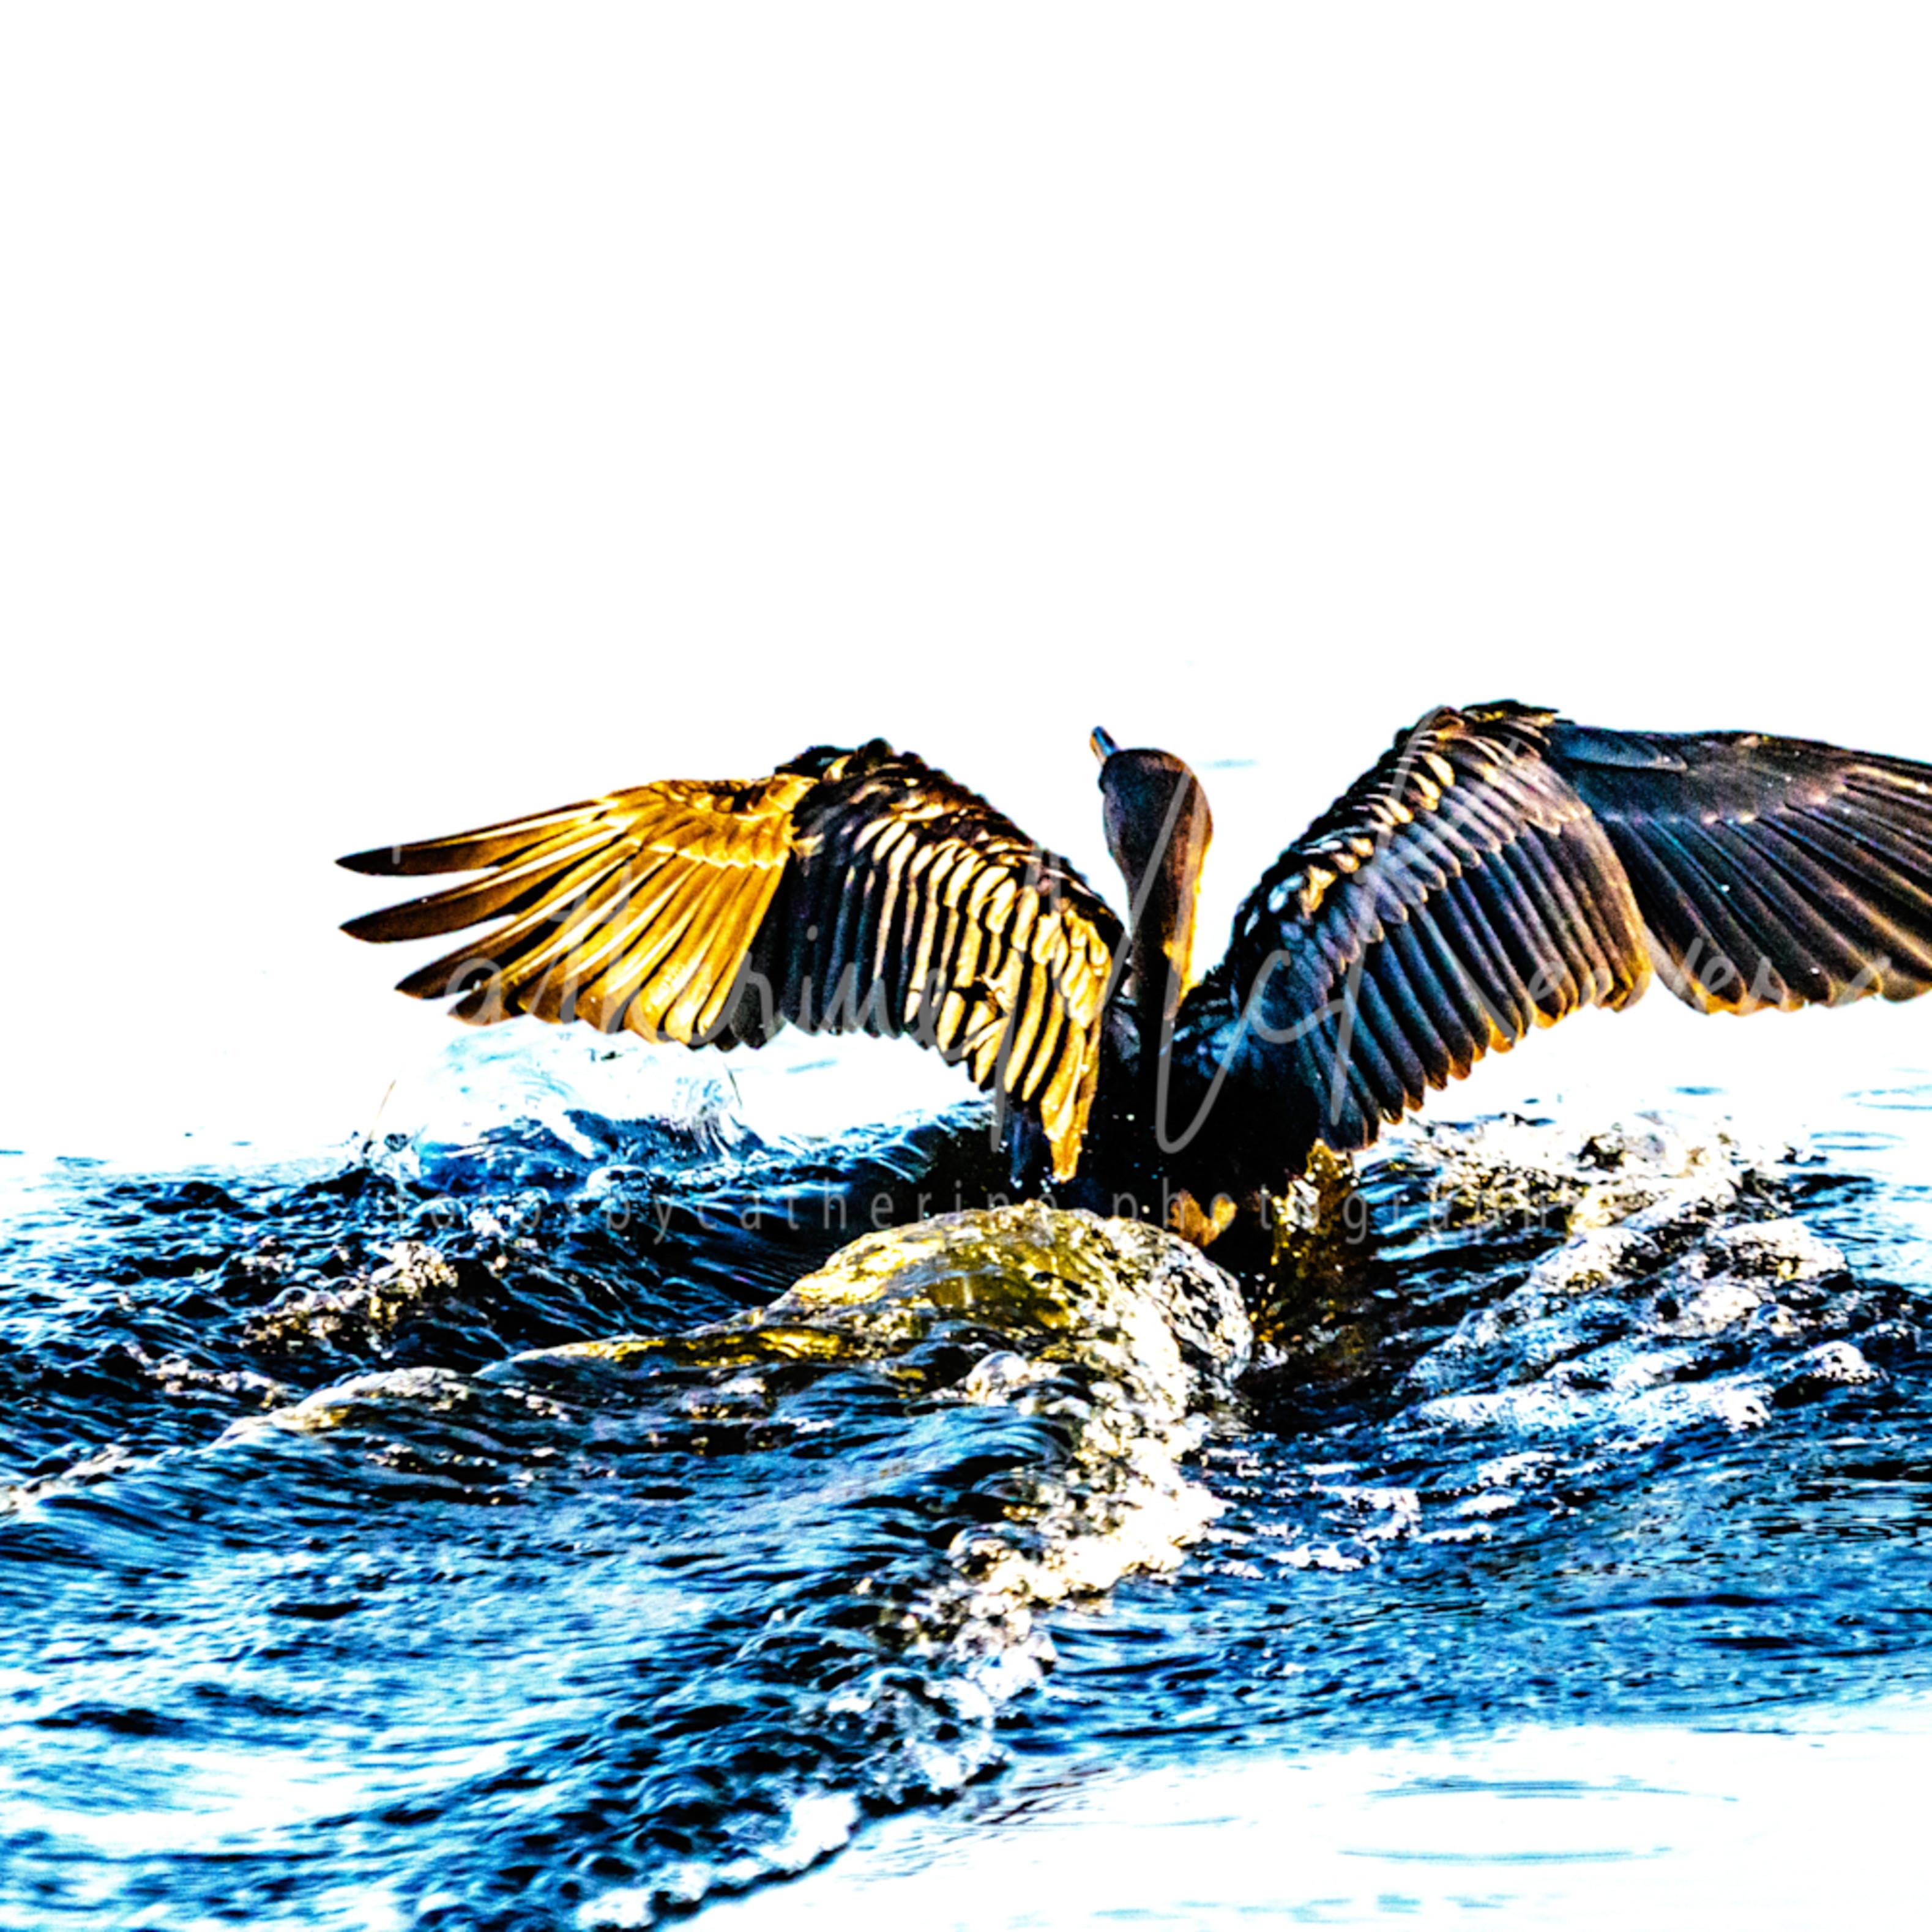 Splash landing jkzqbd